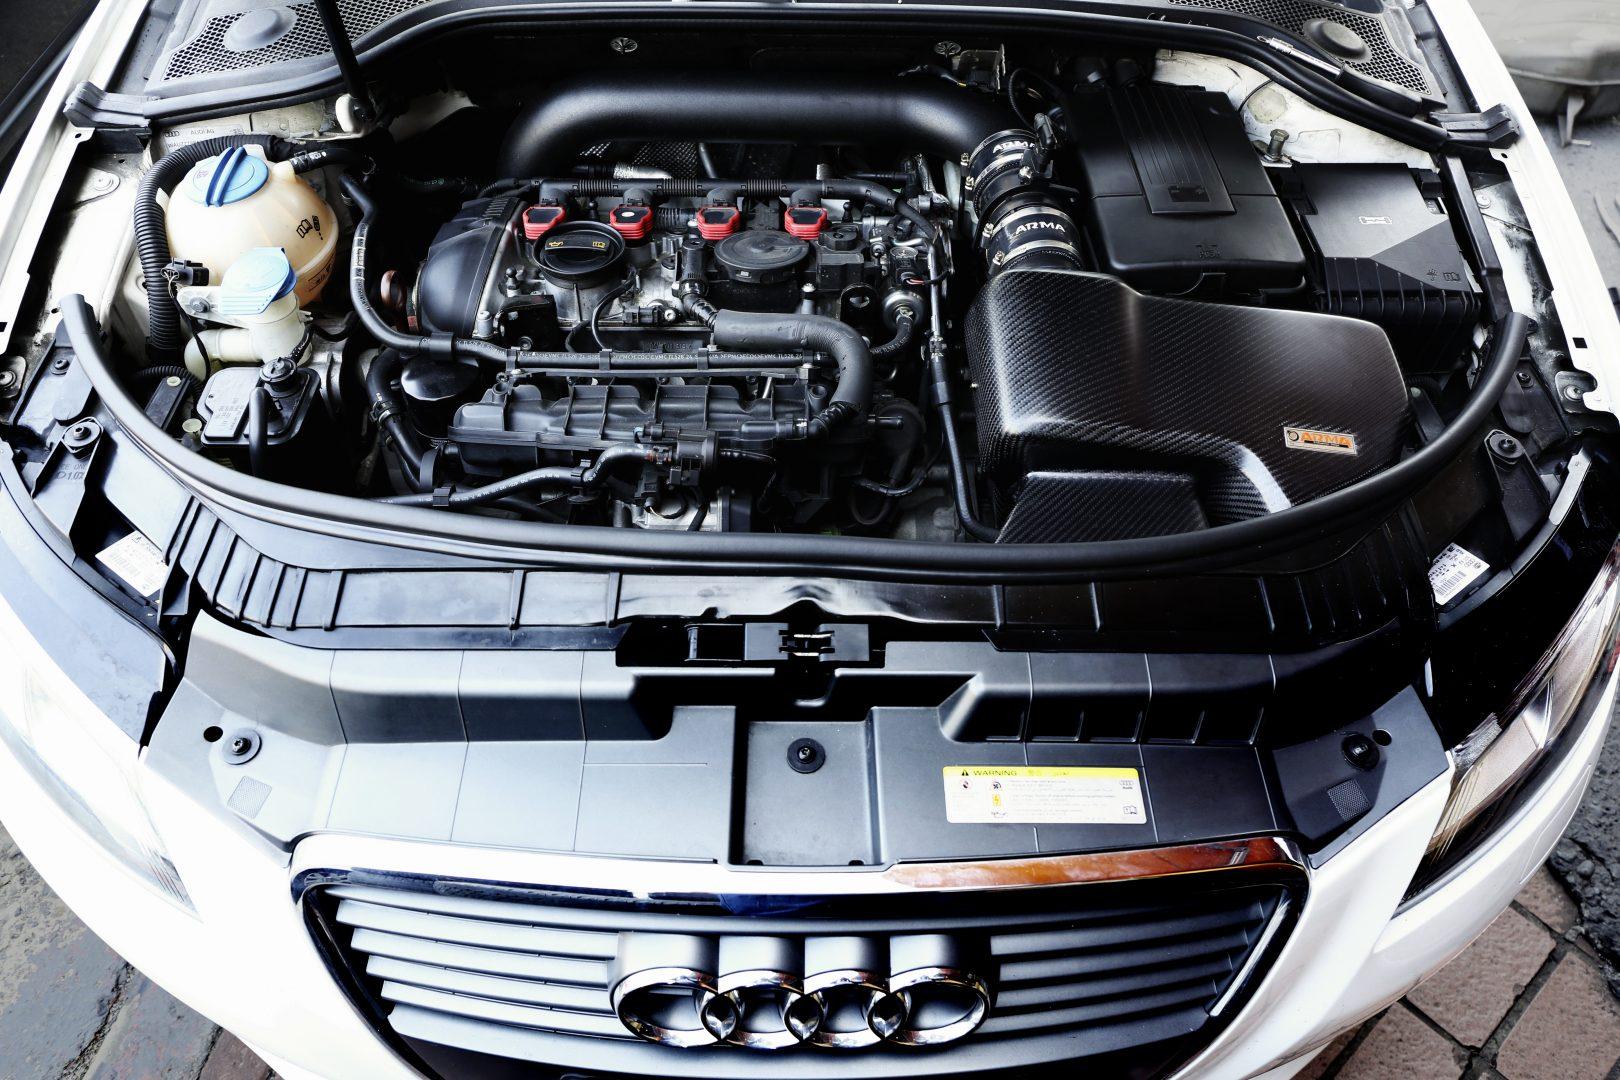 Subaru Dealers Ma >> Audi A3 8P Cold Carbon Intake - ARMA Speed